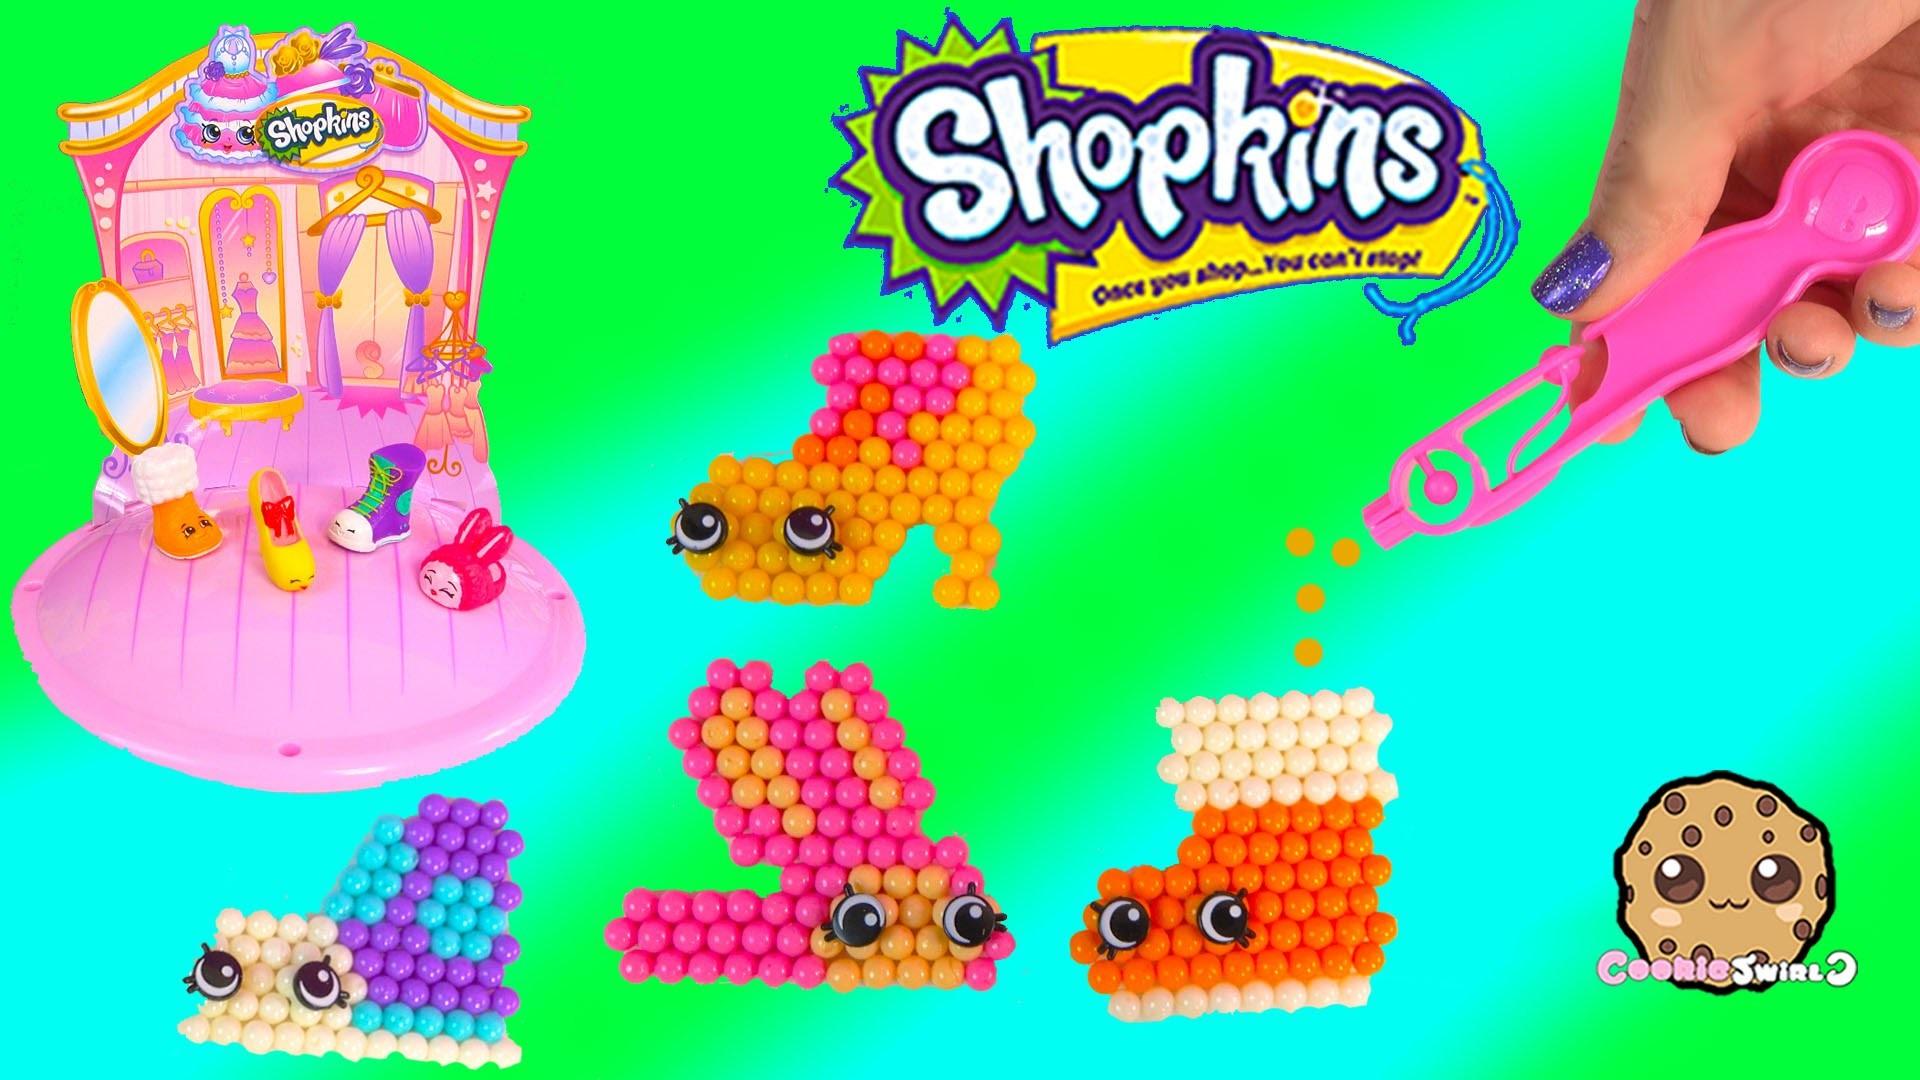 Shopkins Season 2 + 3 Fashion Cuties Beados Shoes Craft Playset Unboxing - Cookieswirlc Video